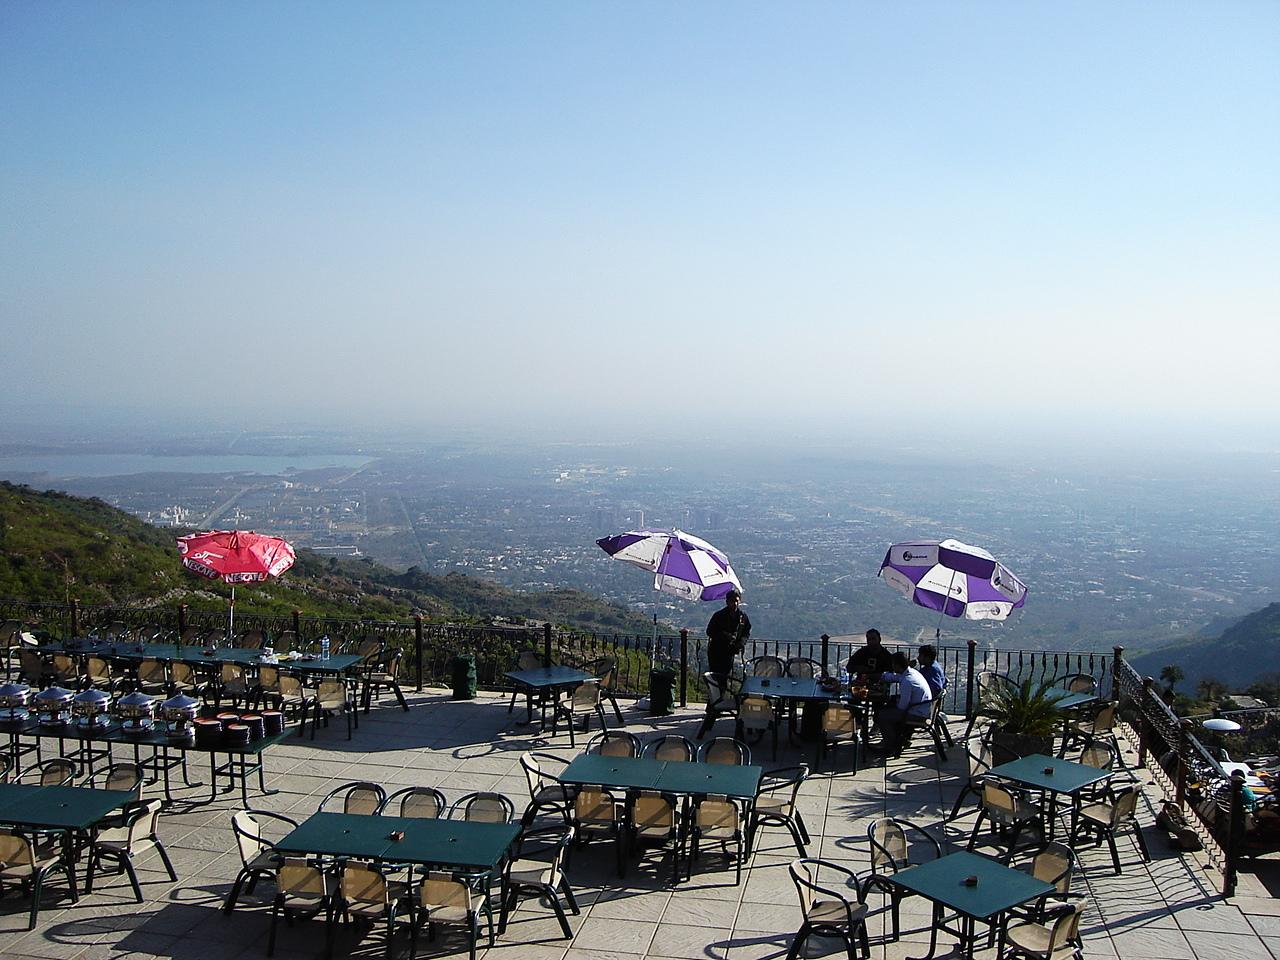 Islamabad View, Pir Sohawa